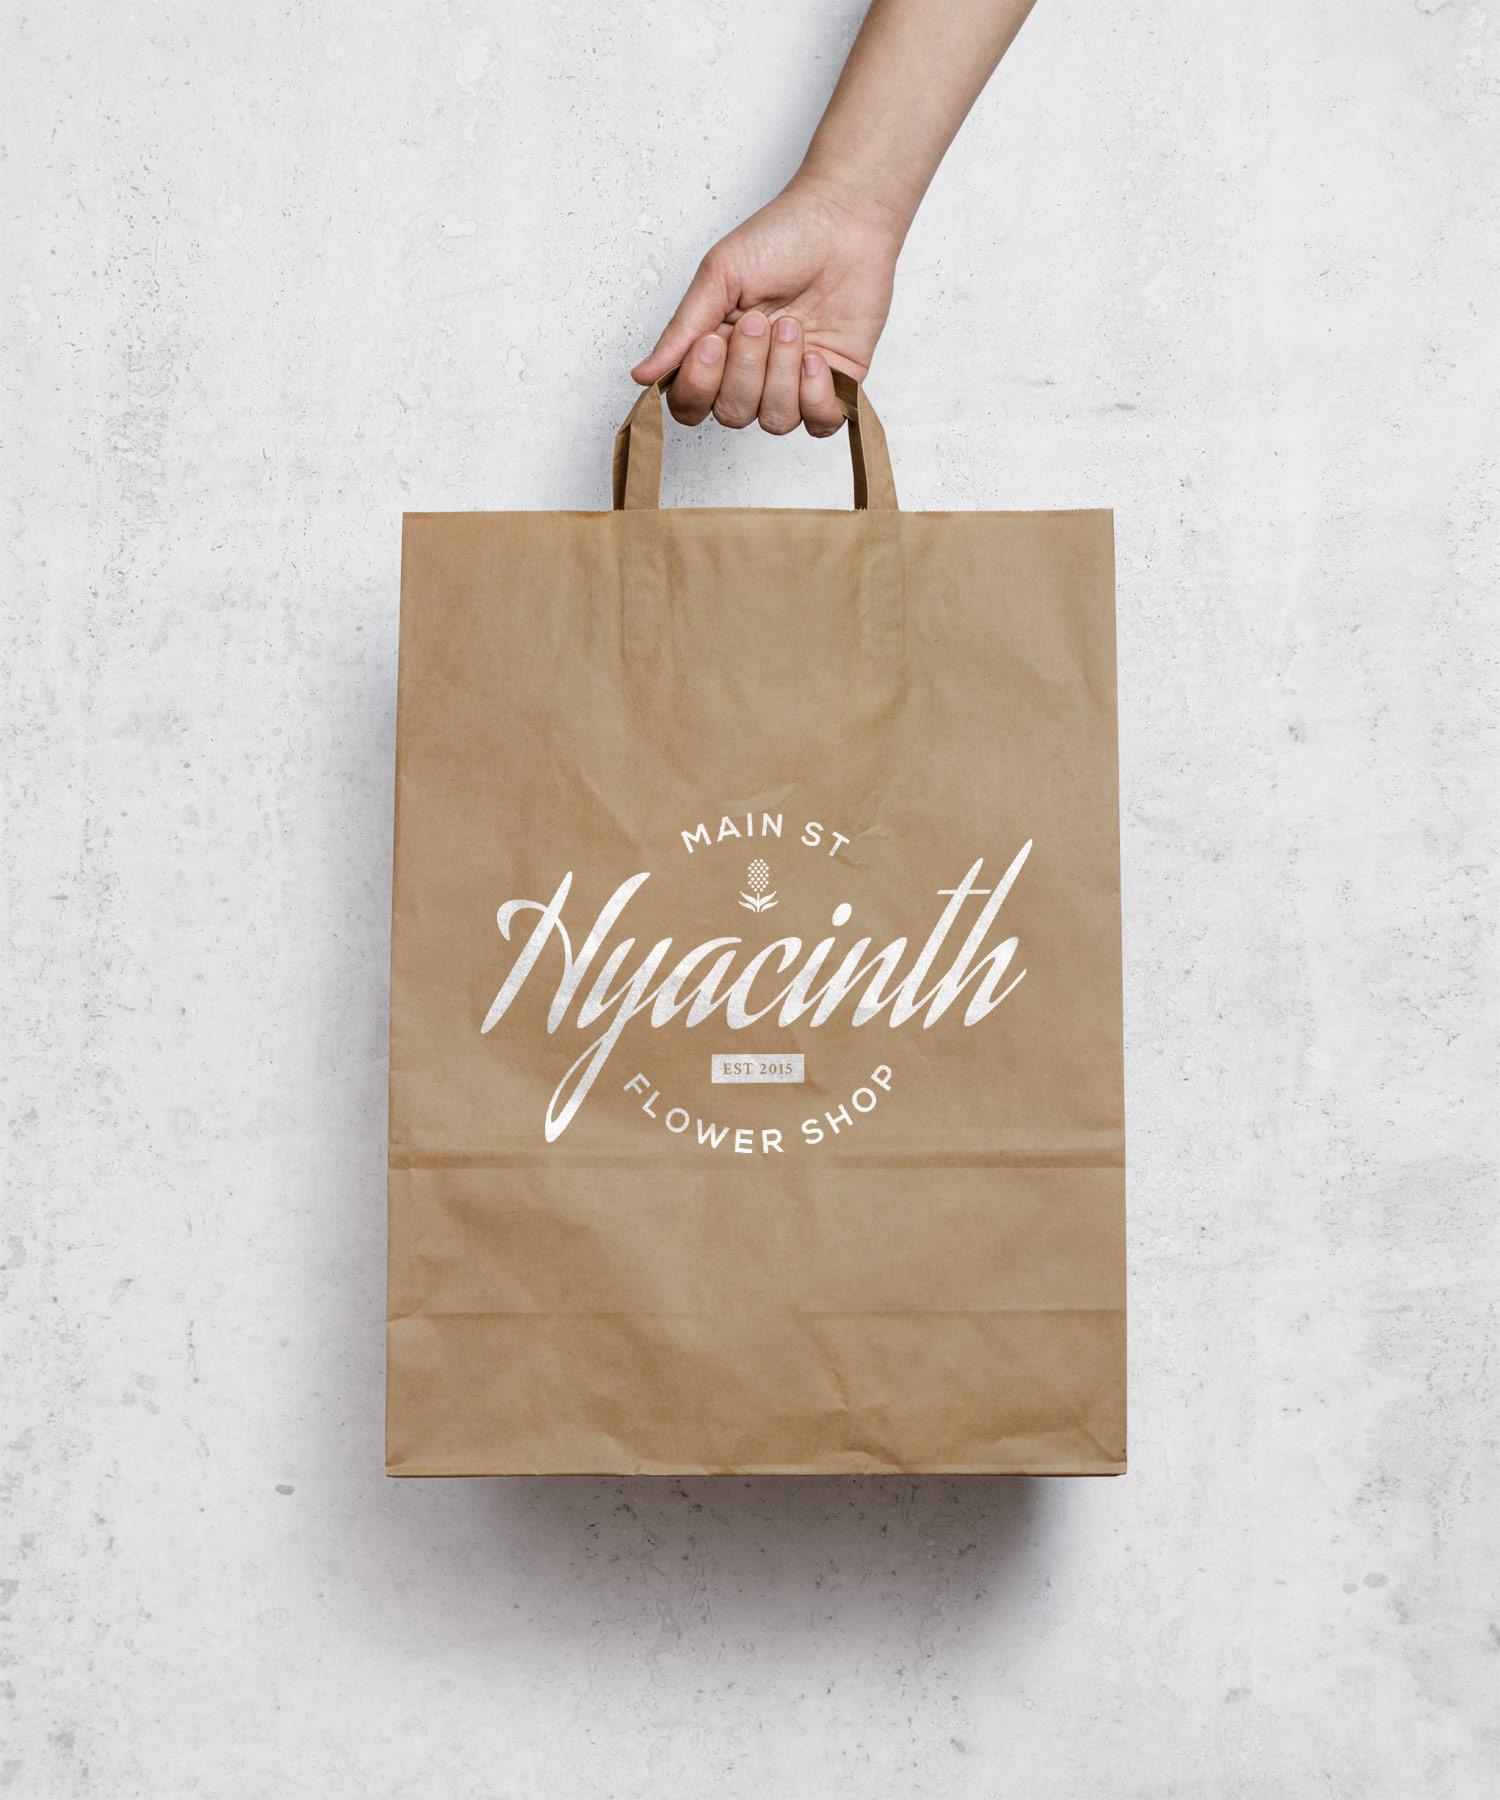 hyacinth-paperbag-mockup2.jpg